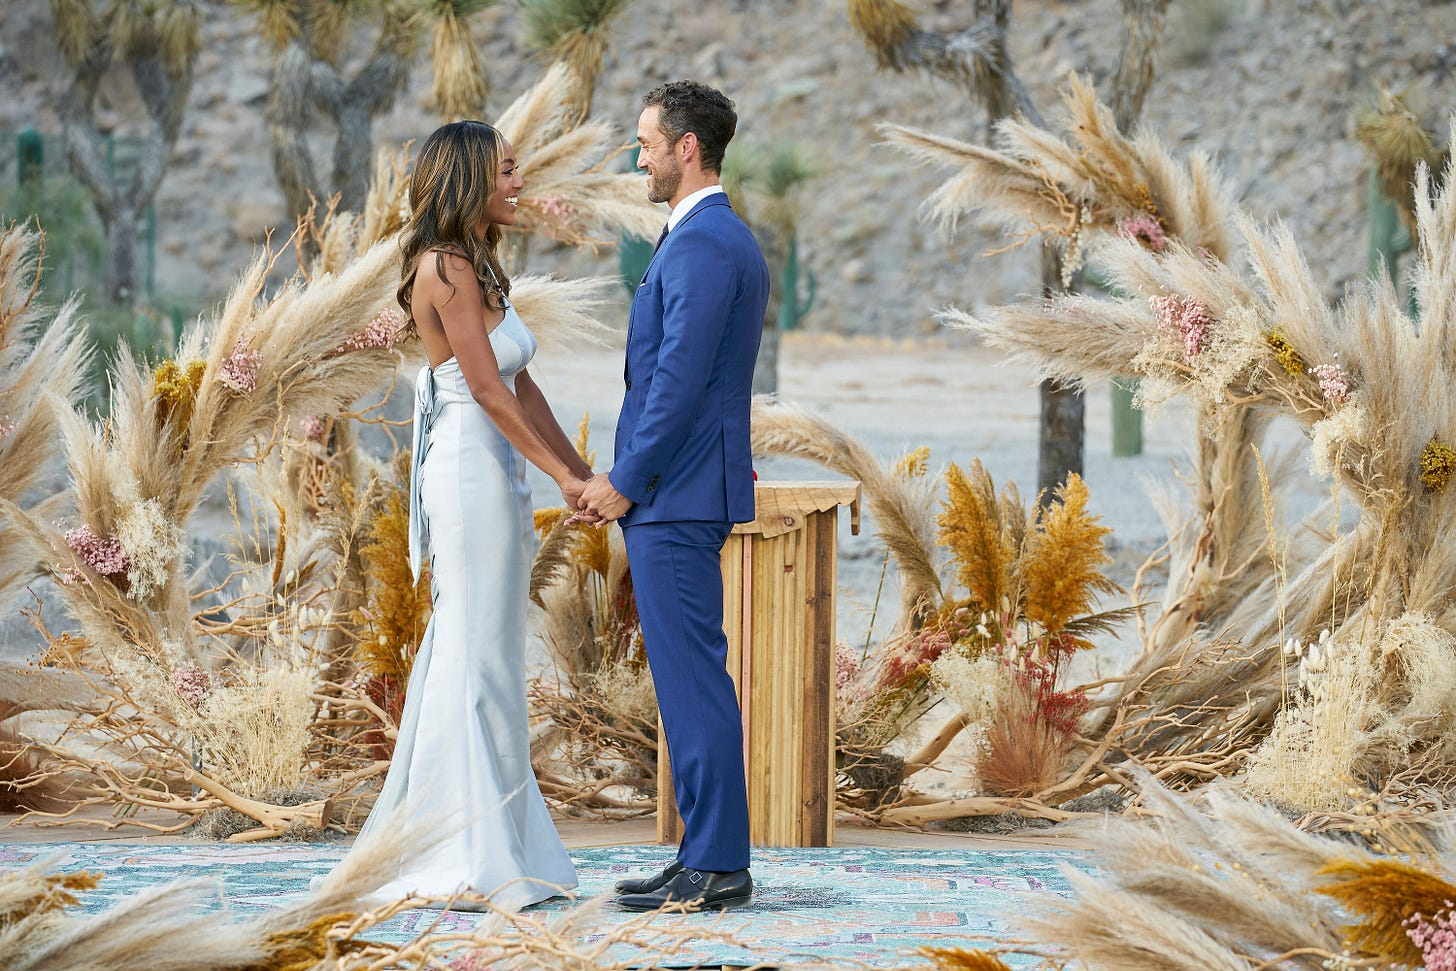 Tayshia Adams And Zac Clark Discuss That 'Bachelorette' Proposal, Reveal  Their Future Plans & More | ETCanada.com